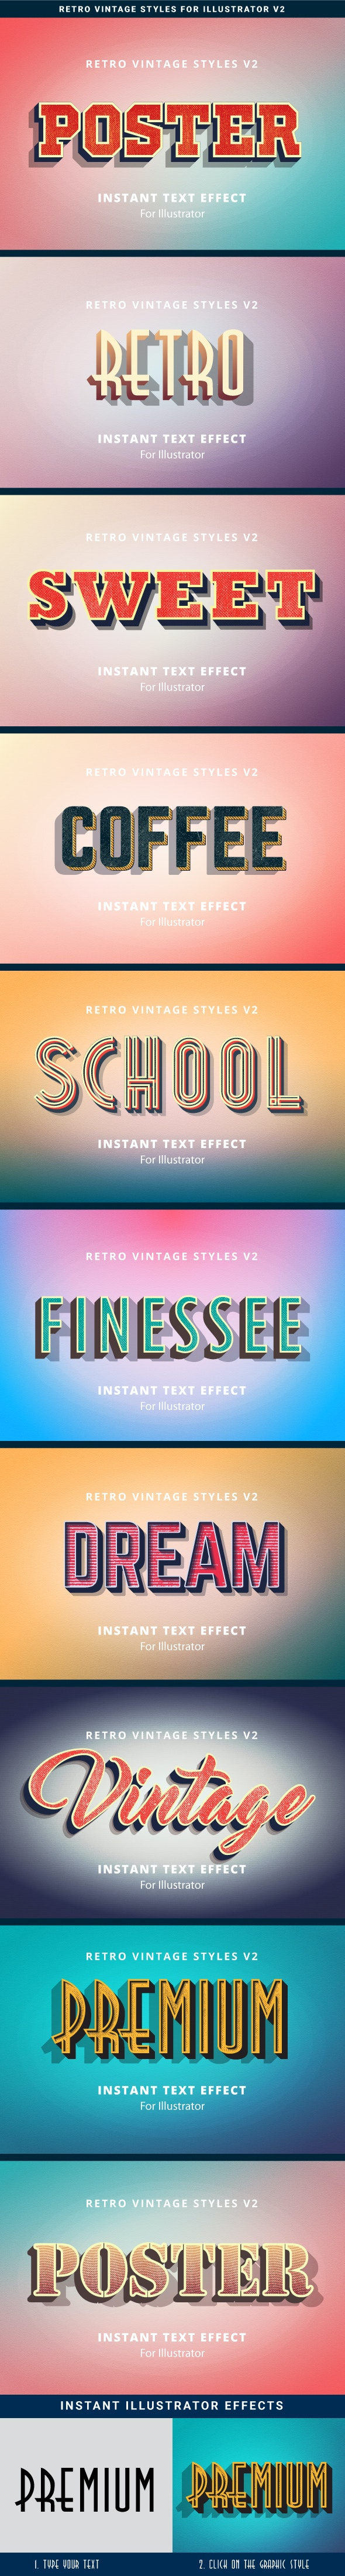 Retro Vintage Text Effects v2 - Styles Illustrator